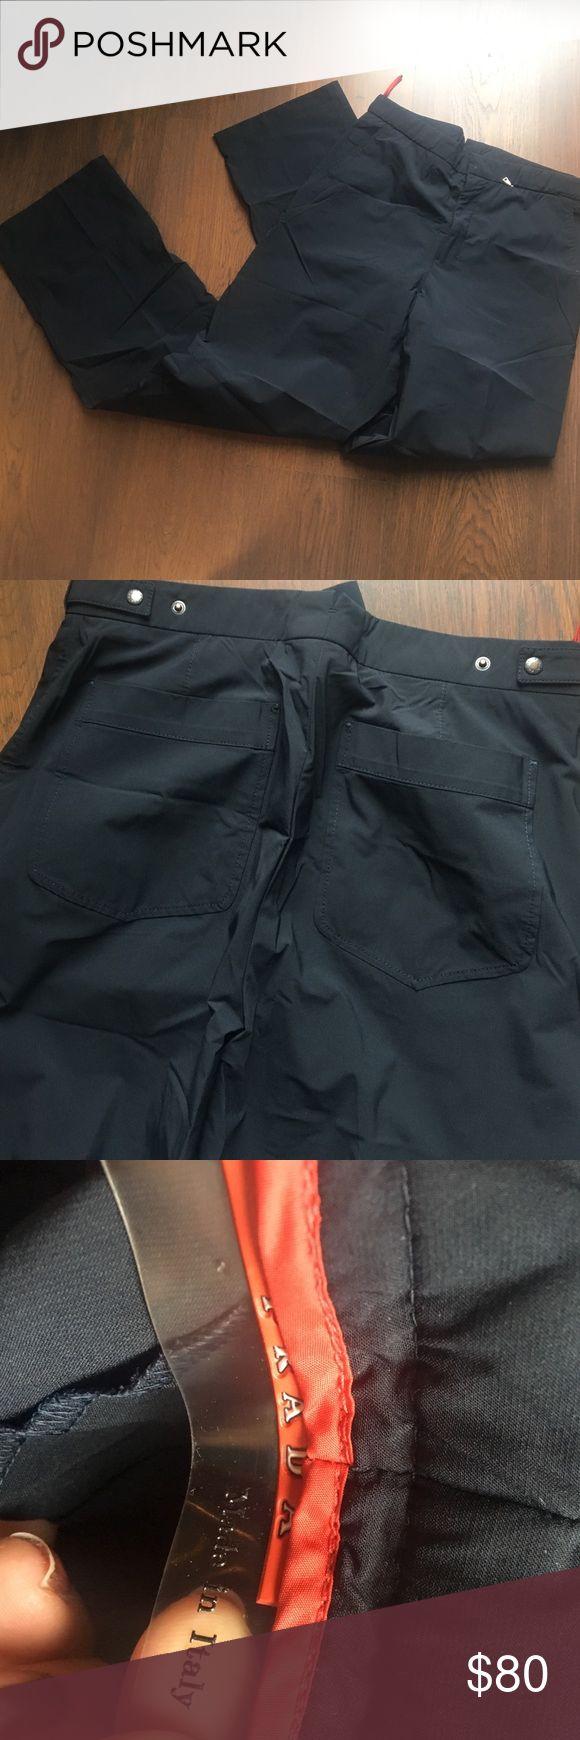 Prada navy pant No size marked - fits men's 30/32 Prada Pants